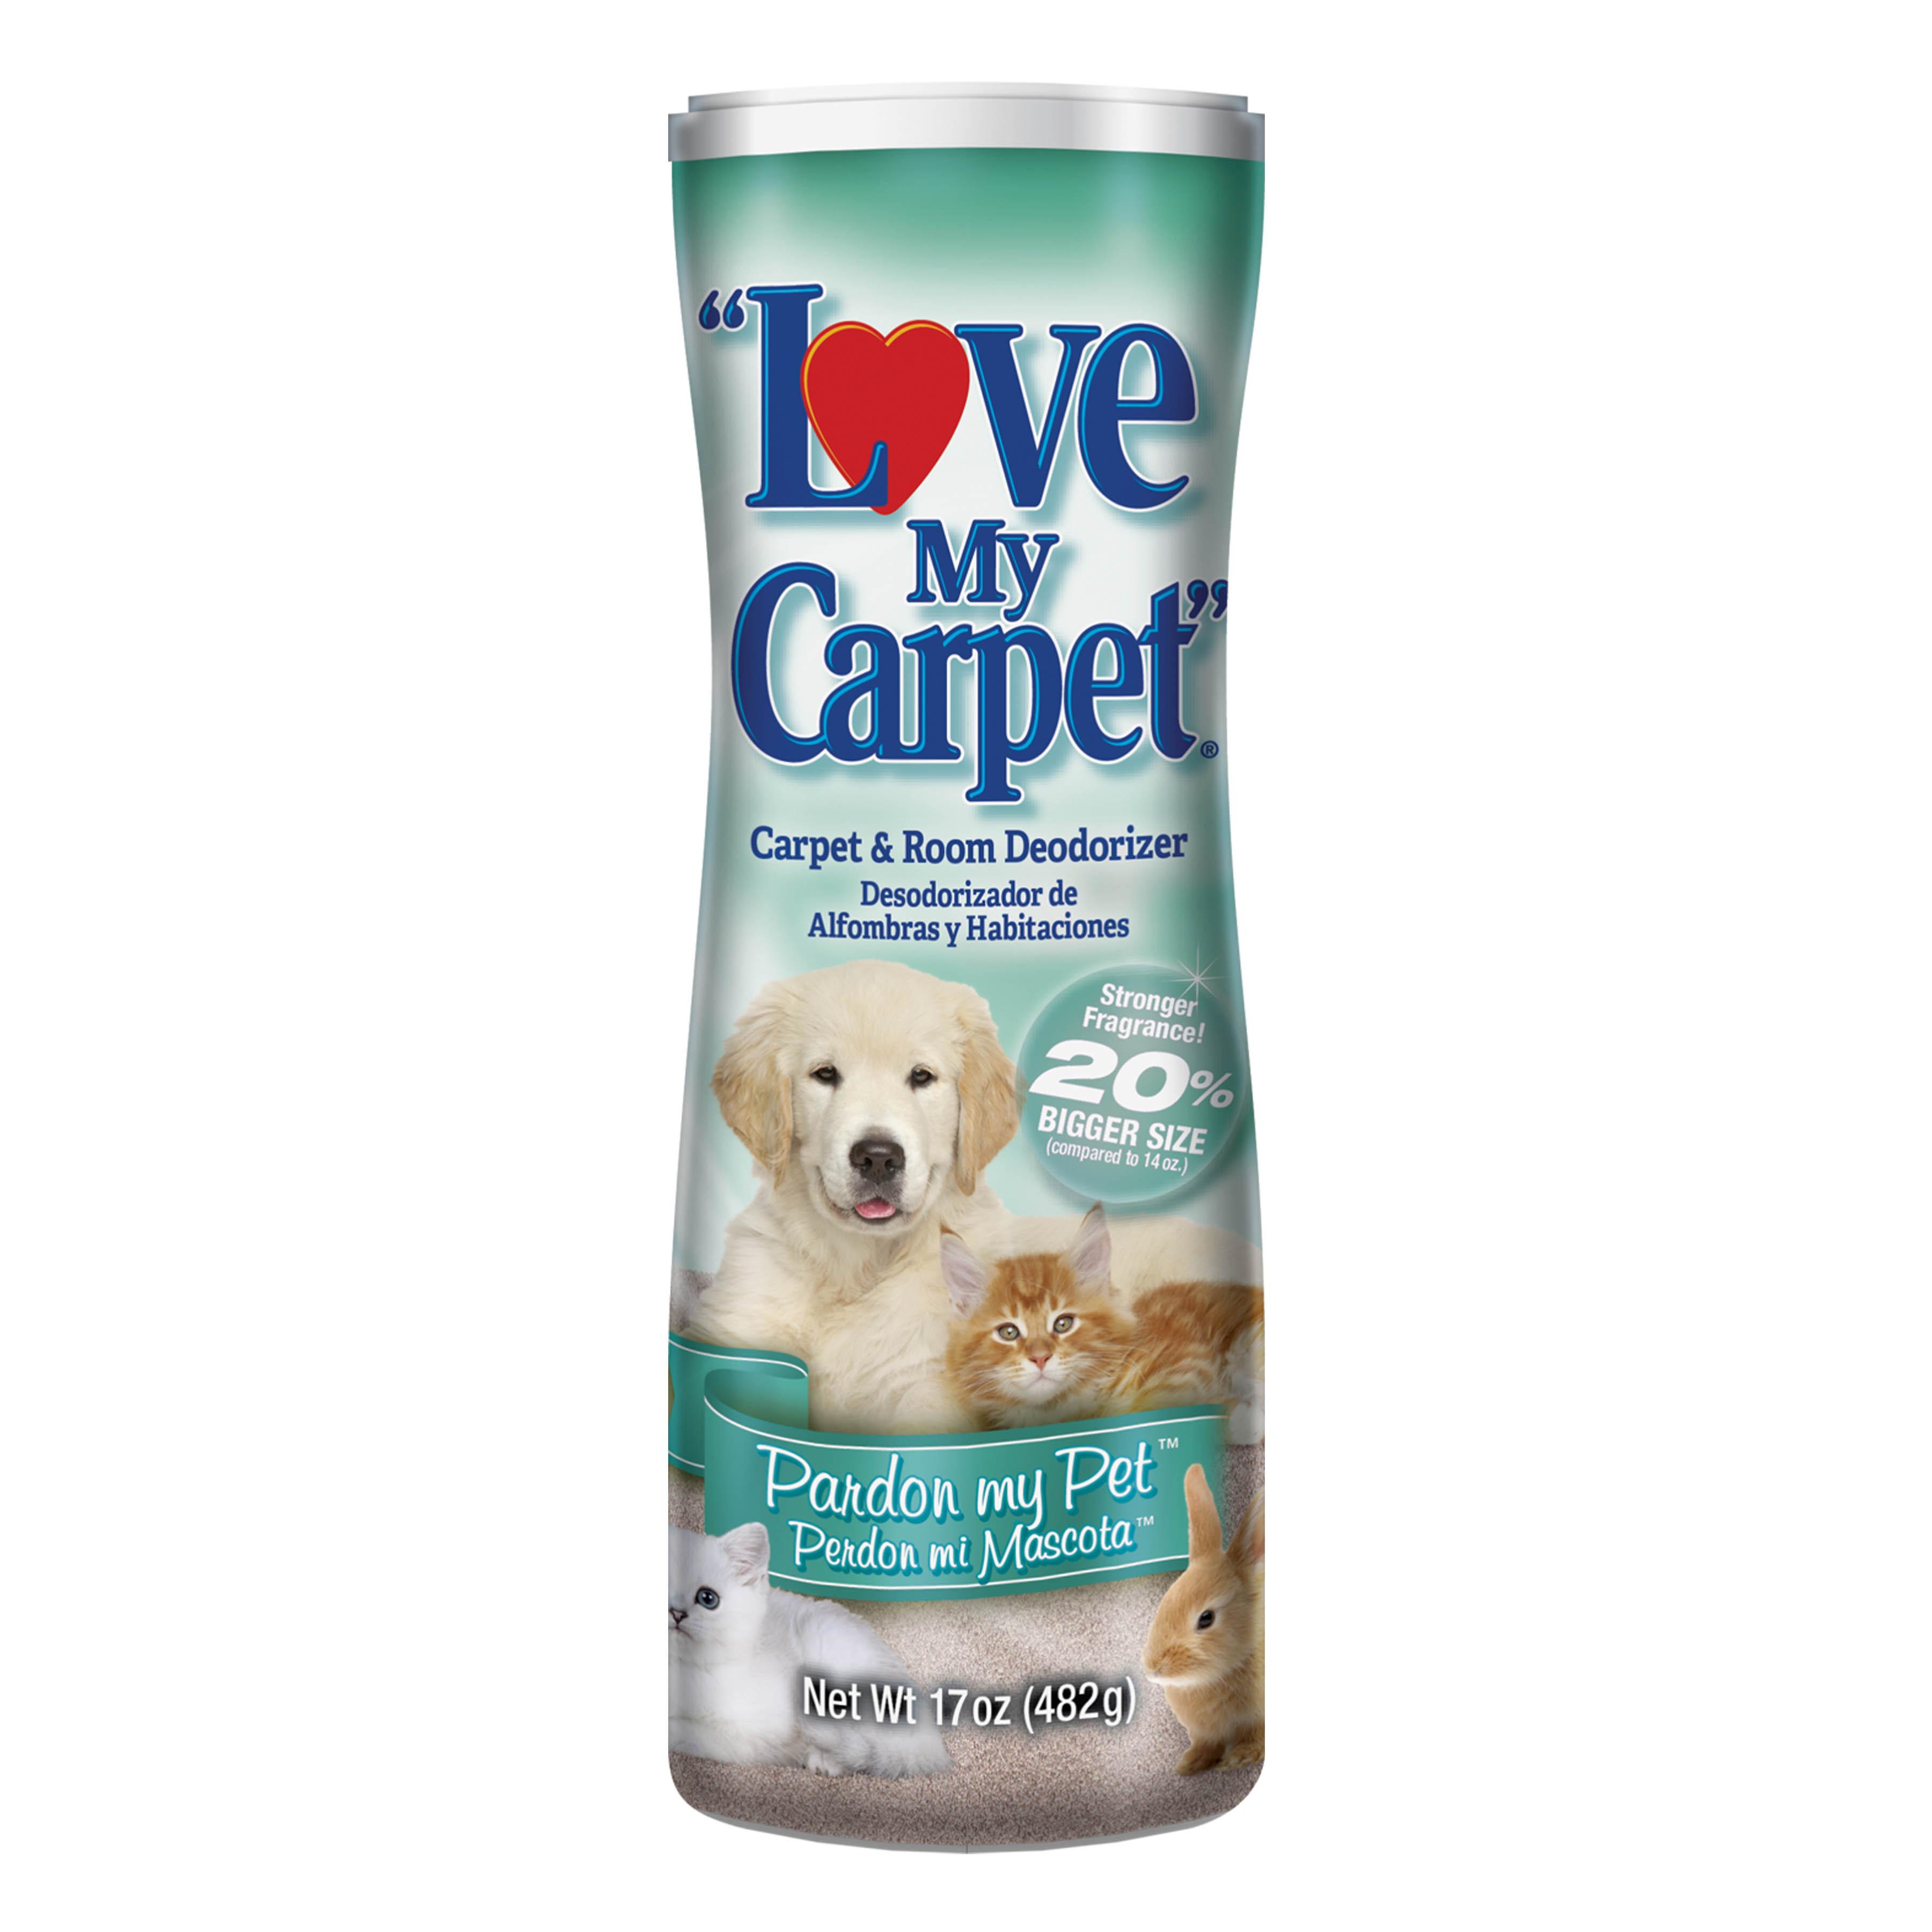 Love My Carpet, Pardon My Pet